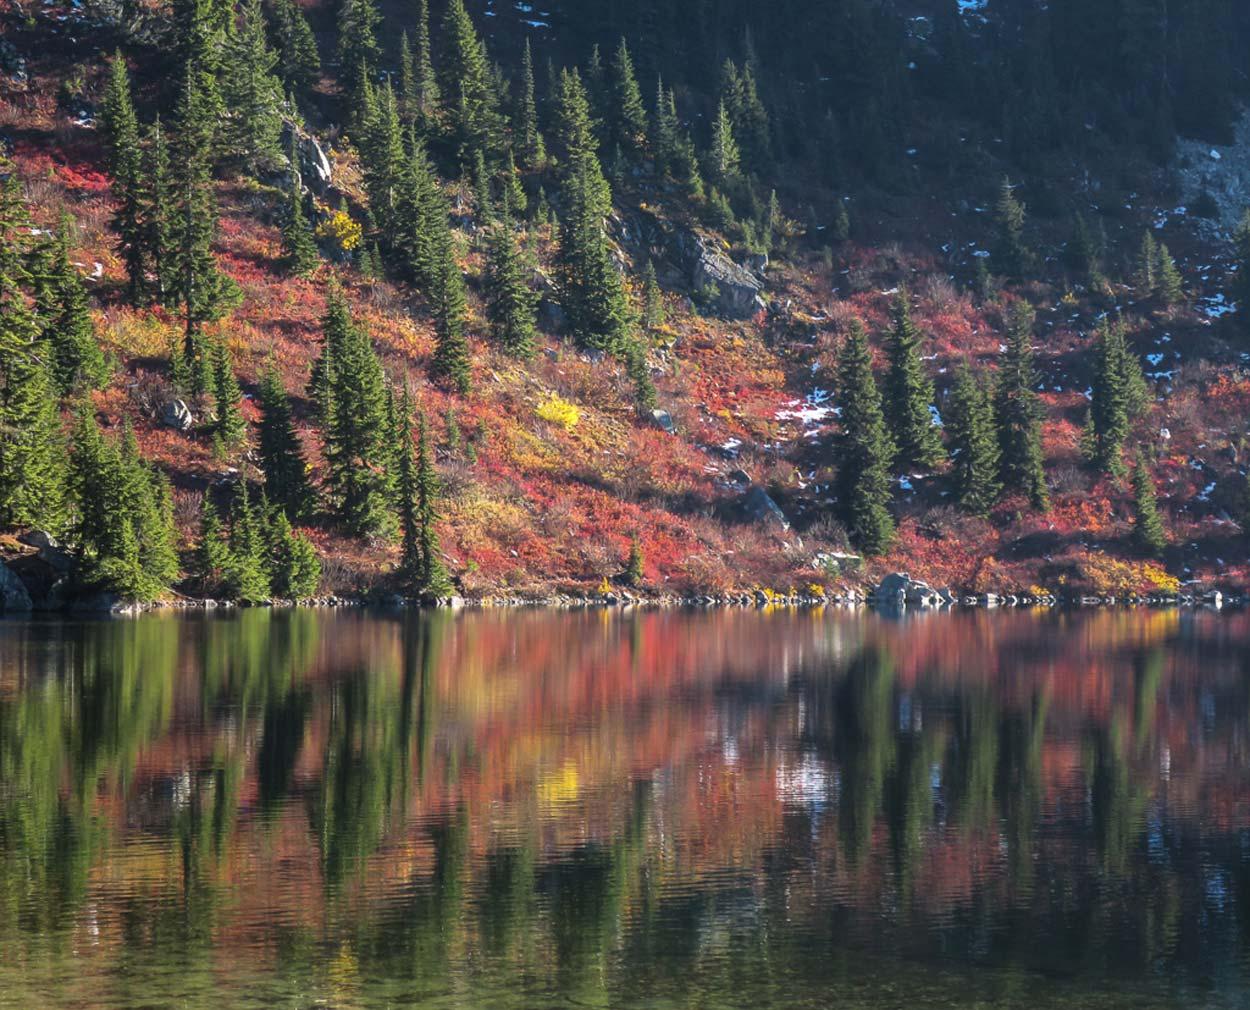 Perfect reflections along Lake Valhalla